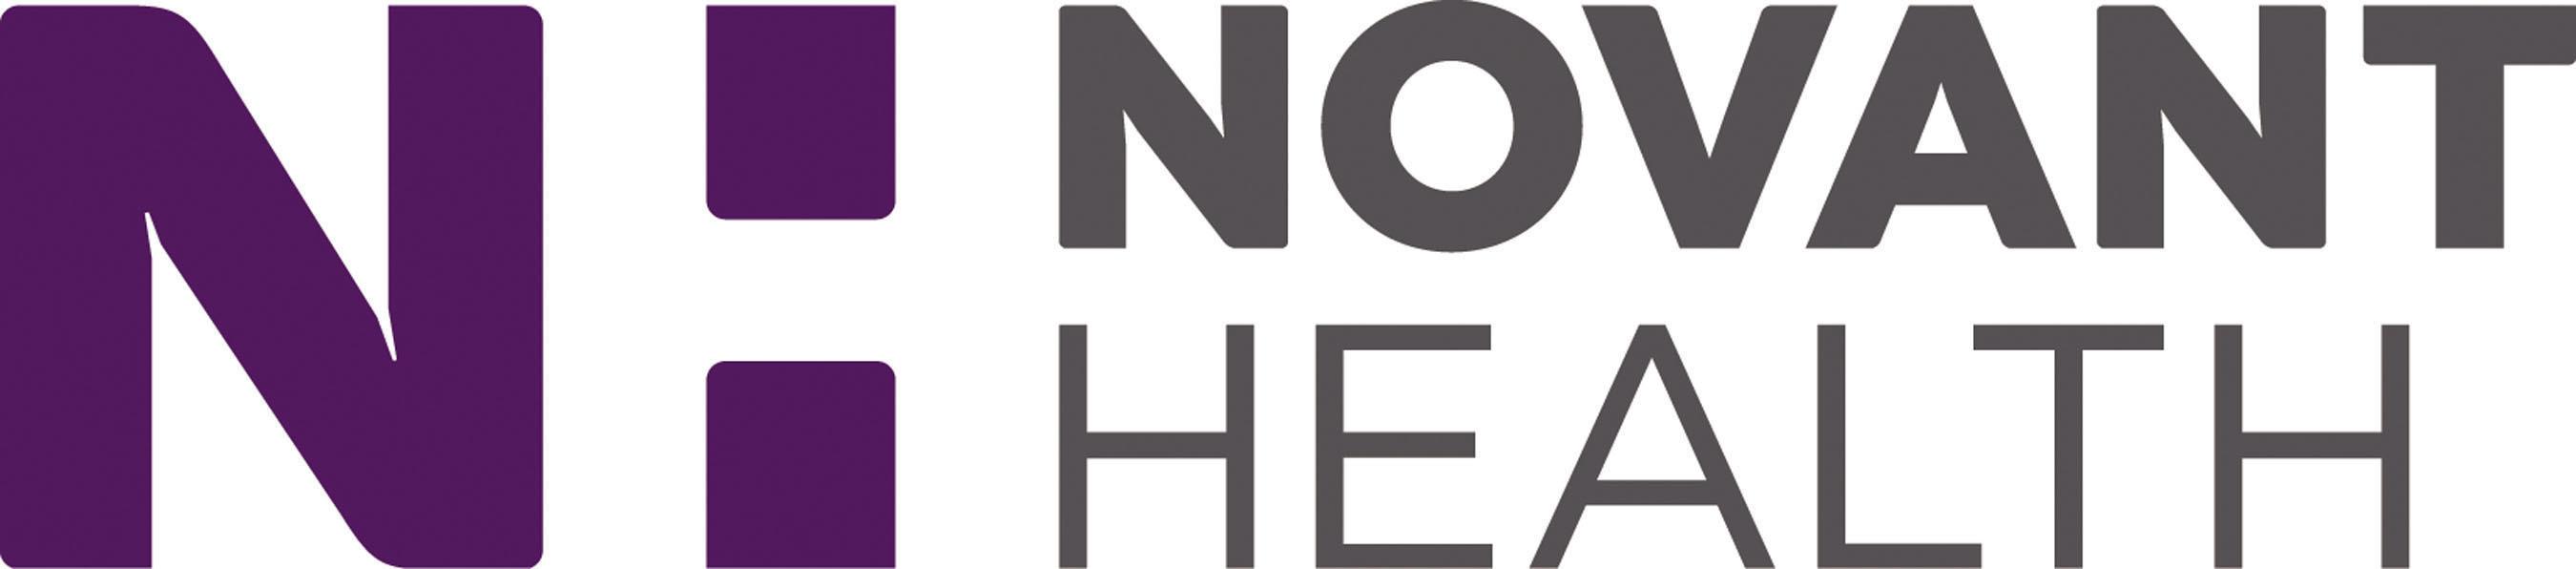 Based in Winston-Salem, North Carolina, Novant Health provides care at 14 medical centers.